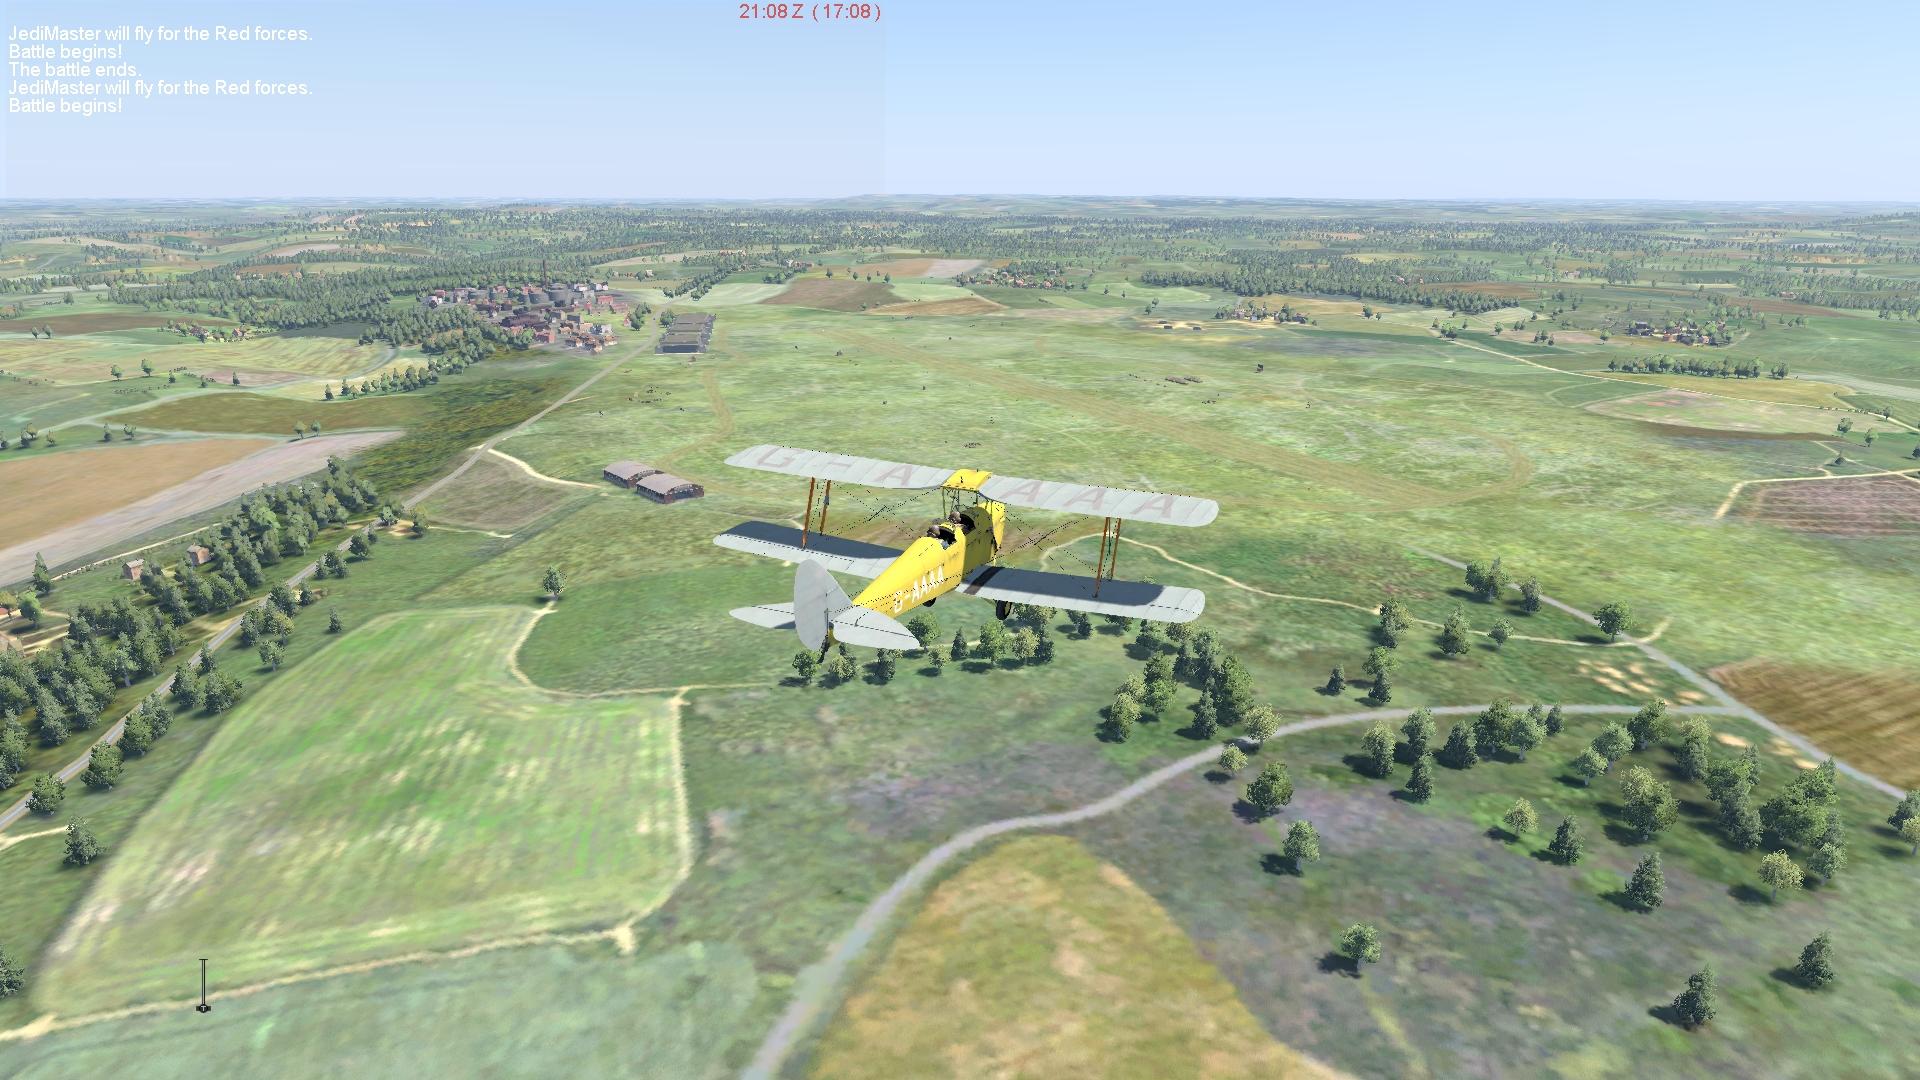 COD Tiger Moth over England